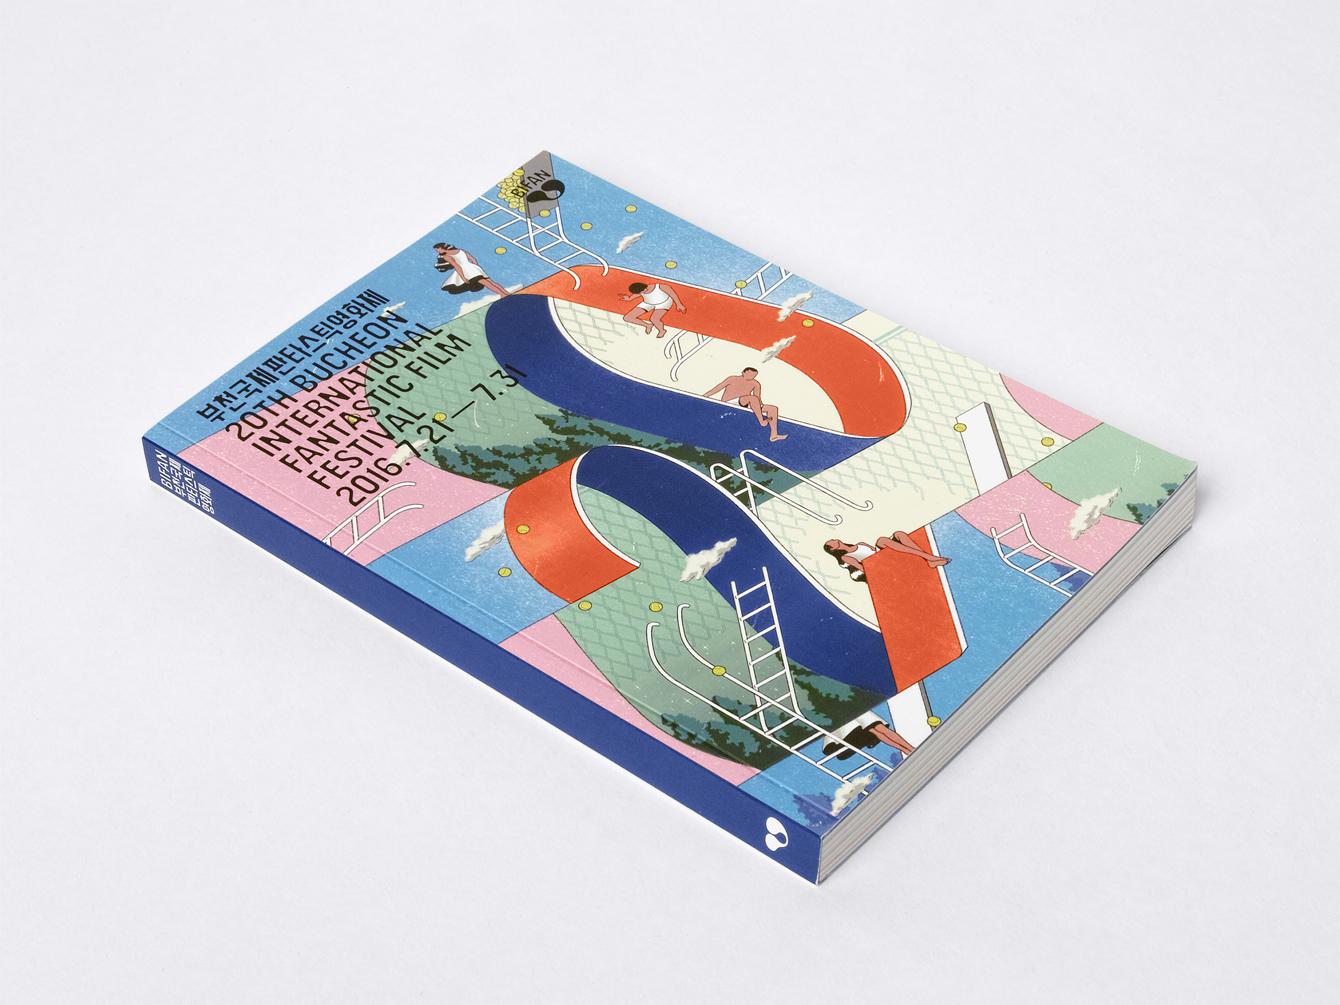 Brochure by Studio fnt for 20th Bucheon International Fantastic Film Festival, South Korea